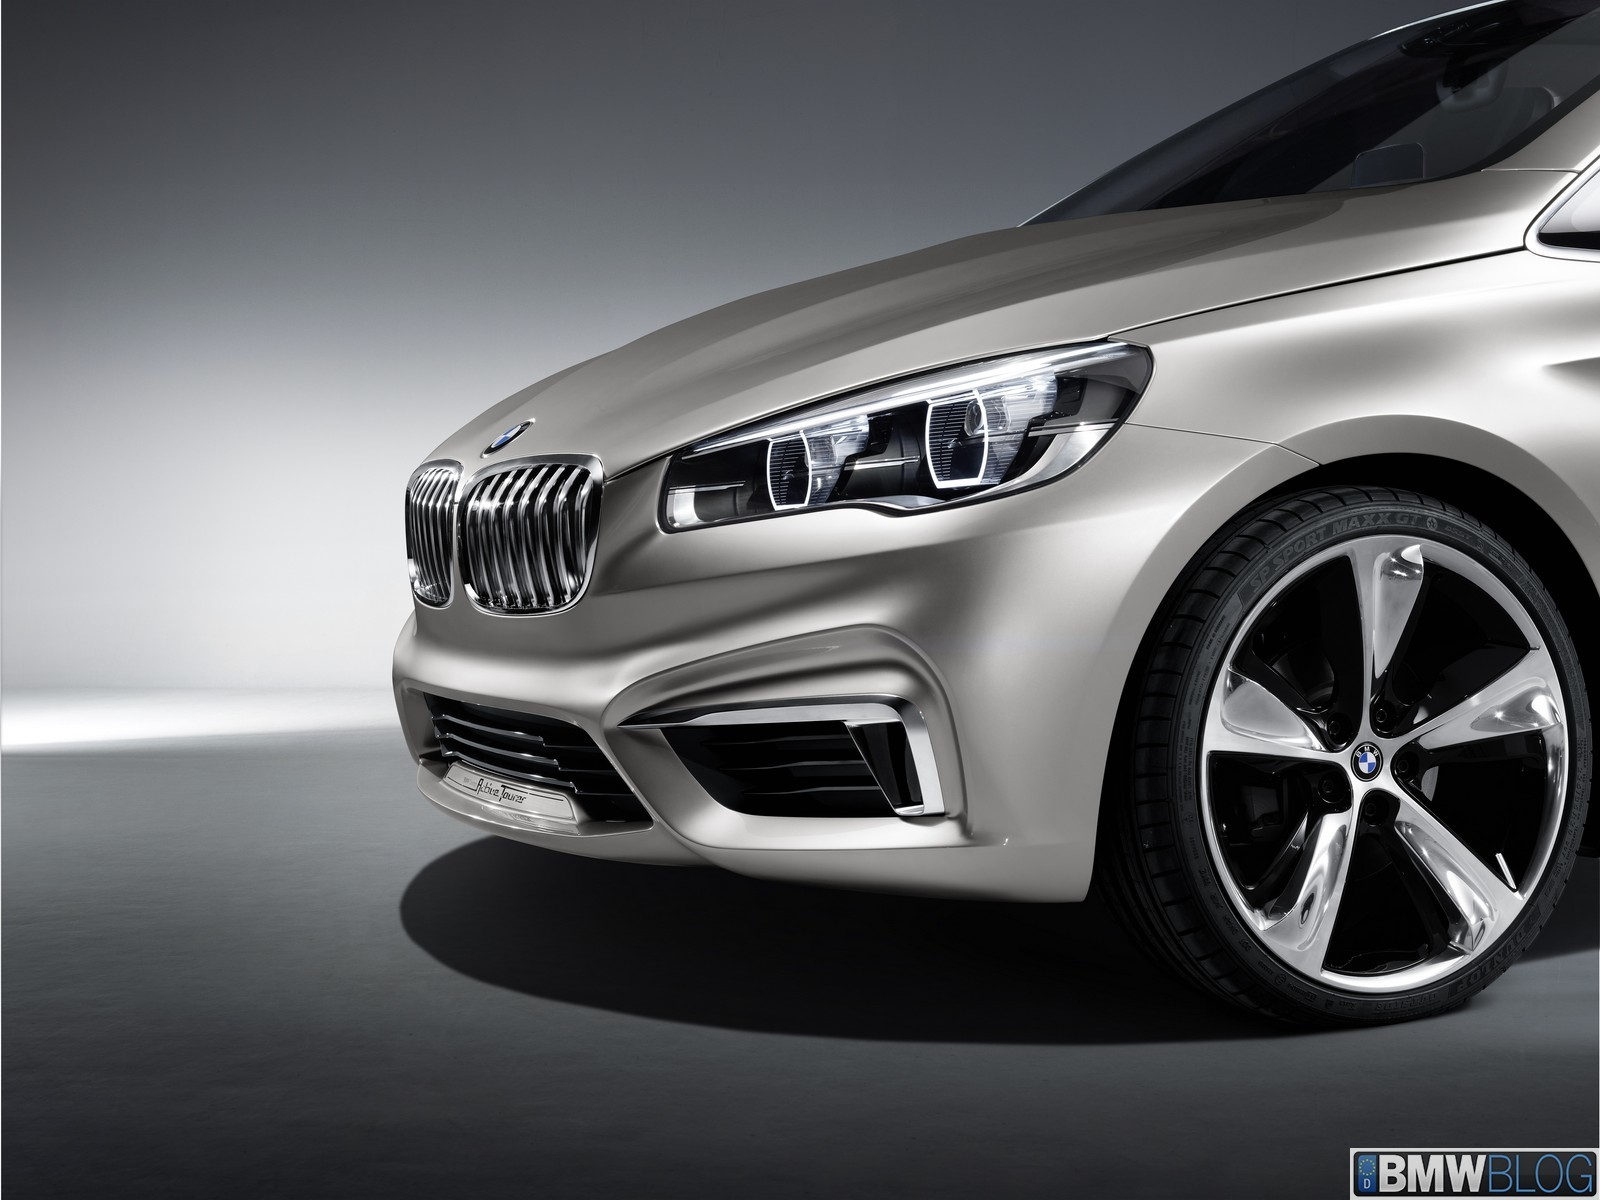 BMW-Active-Tourer-Concept-Exterior-121